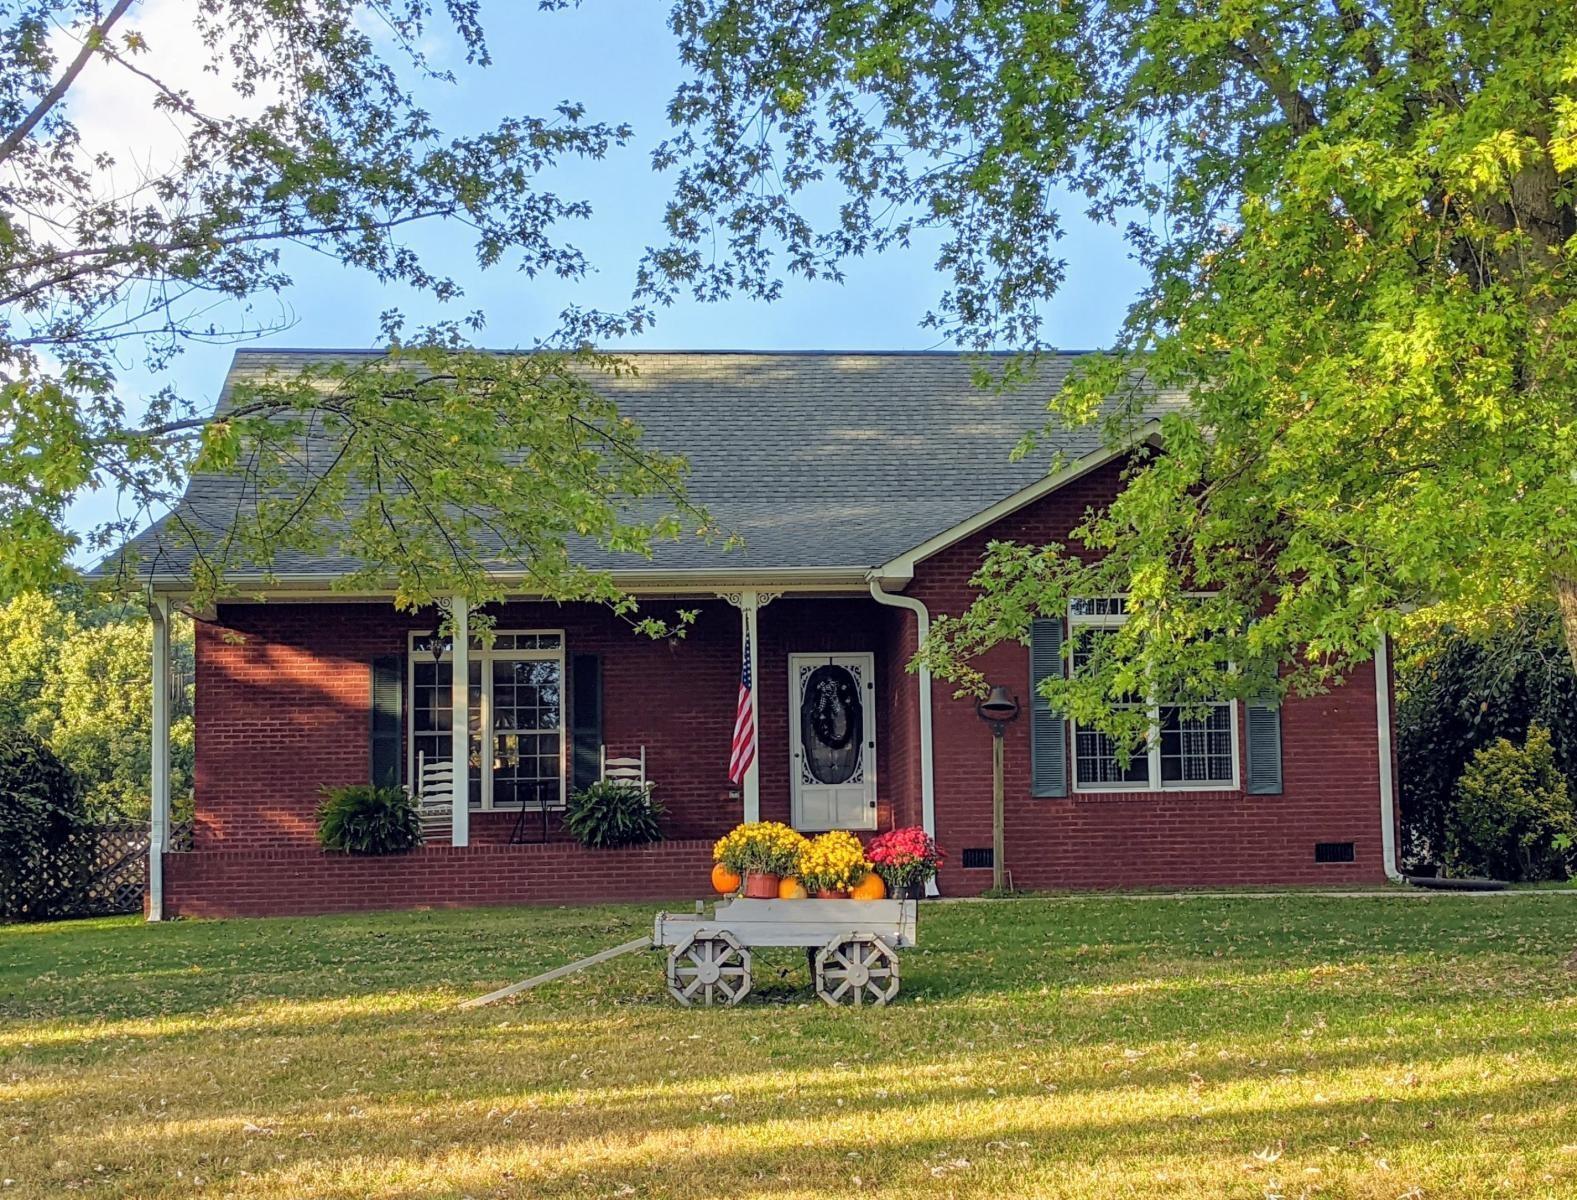 27809 SR 108 Property Photo - Gruetli Laager, TN real estate listing